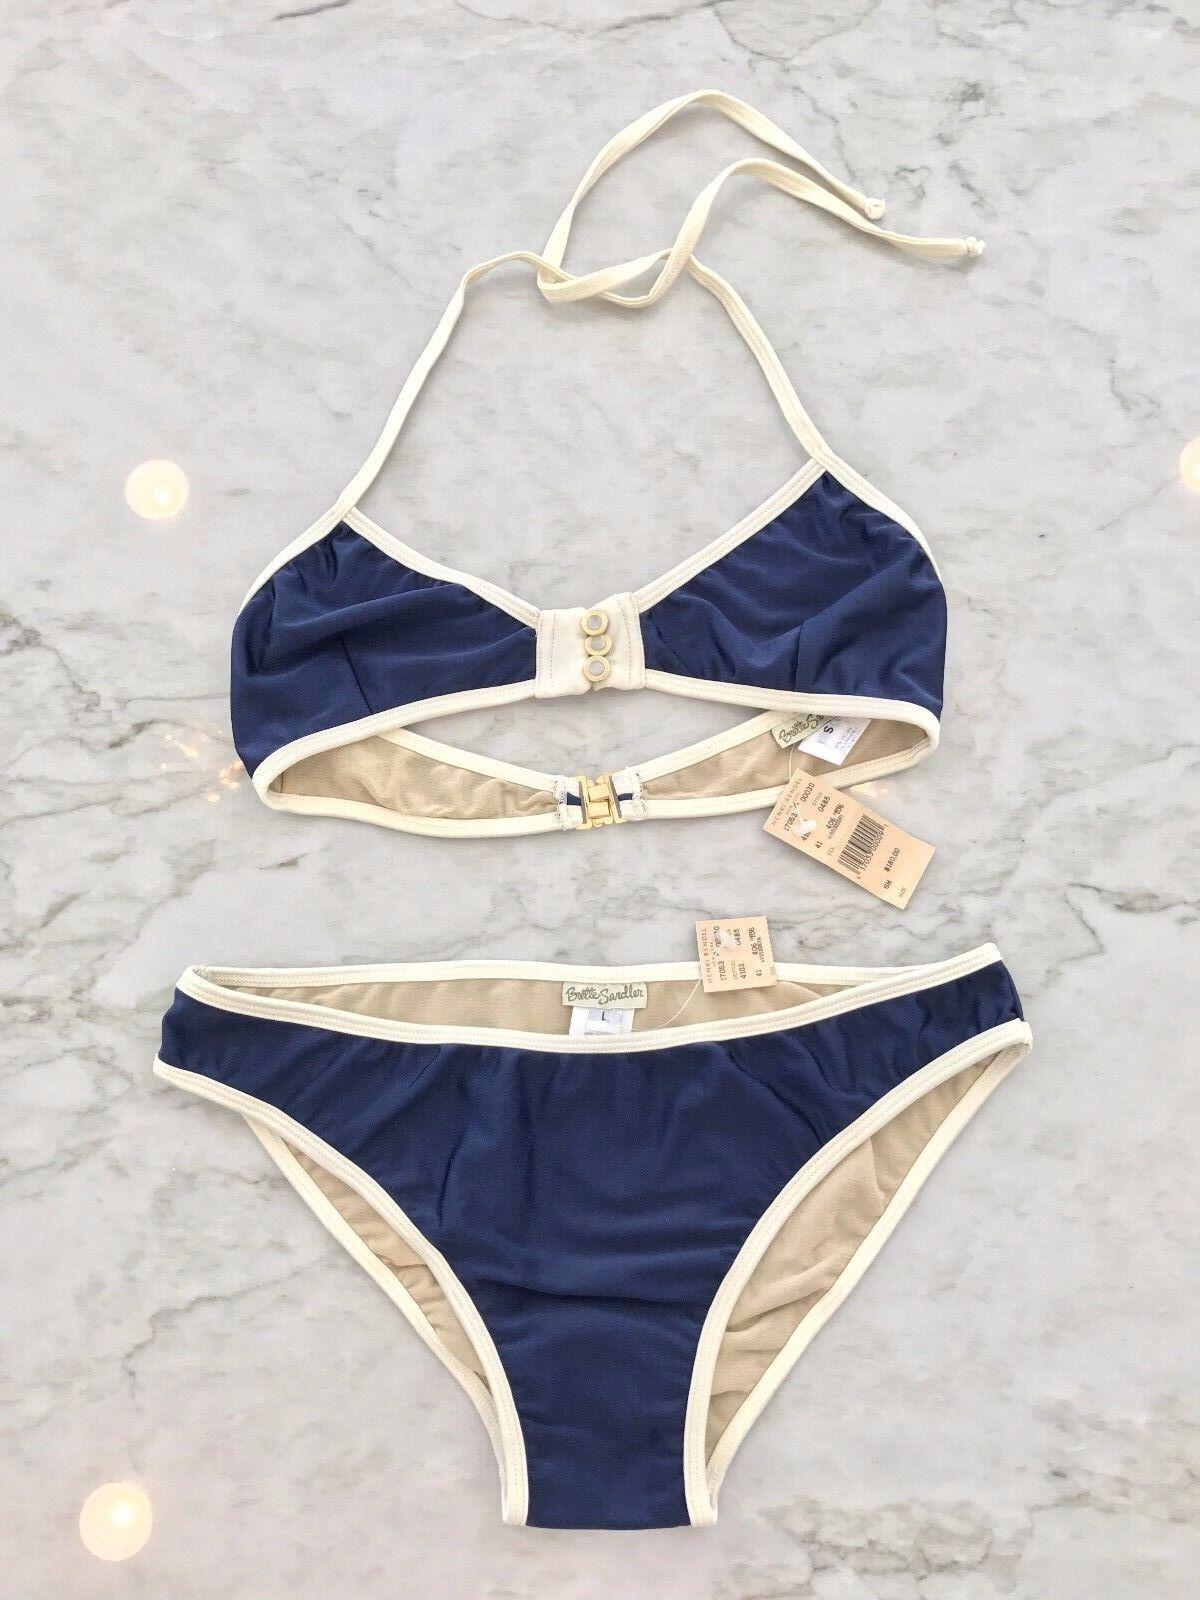 7ce9d12510c NWT 320 BRETTE SANDLER NAVY IVORY WHITE TRIANGLE BIKINI SIZE S blueE  pfukzl6661-Swimwear